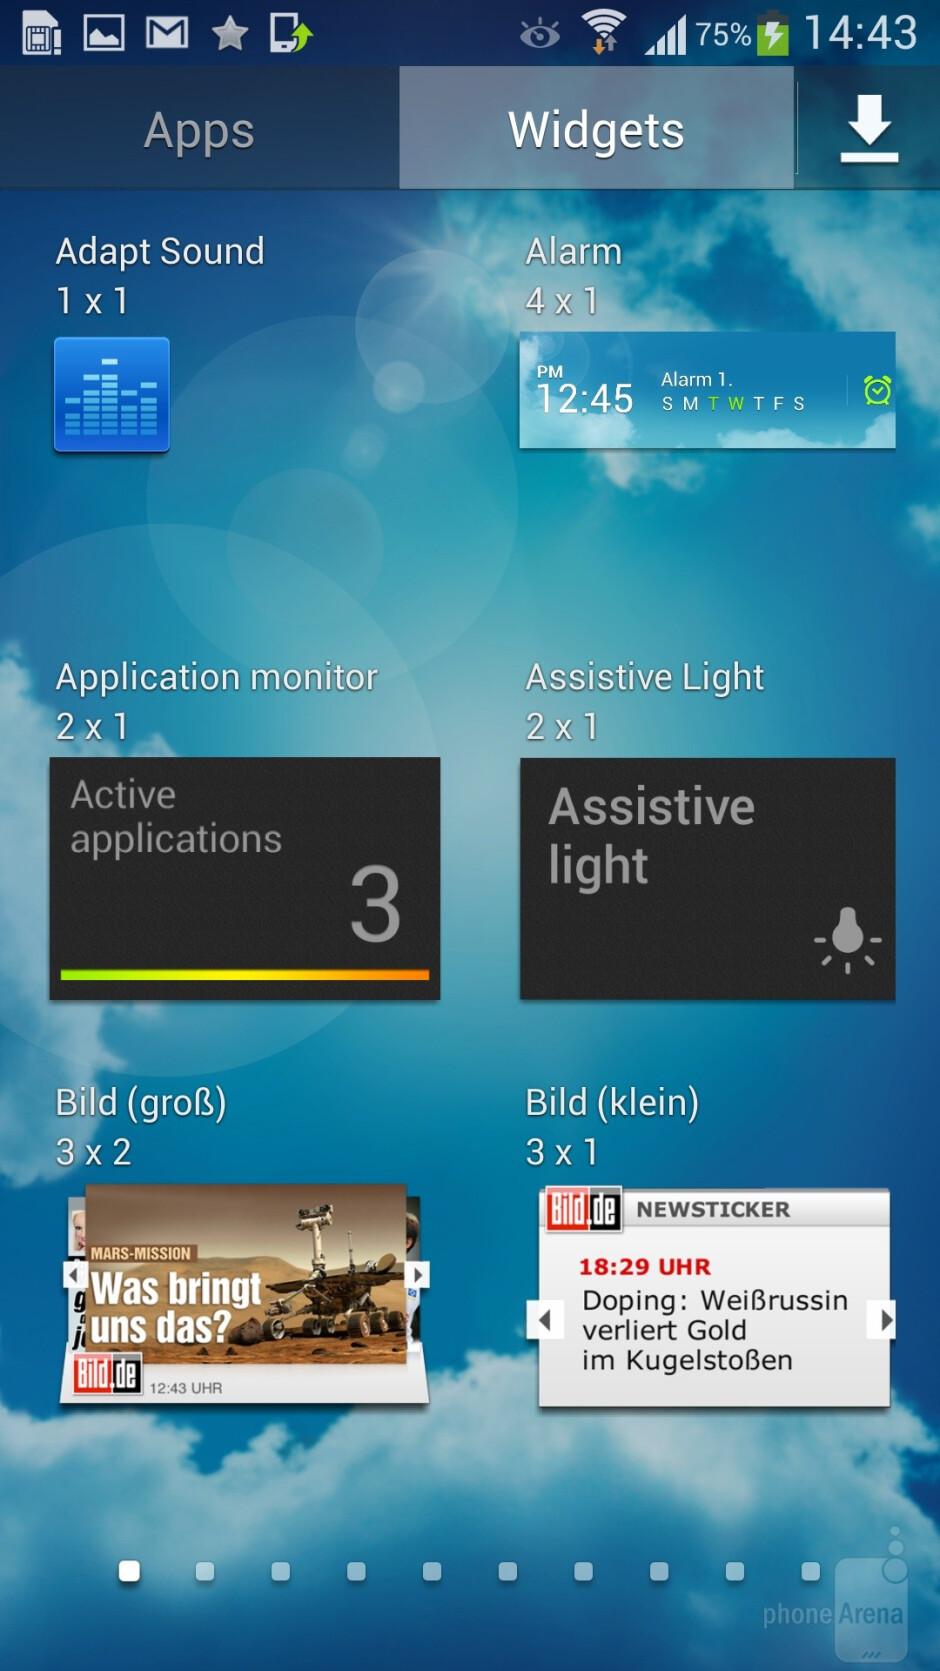 Samsung Galaxy S4 runs Android 4.2.2 - Samsung Galaxy S4 vs Sony Xperia Z